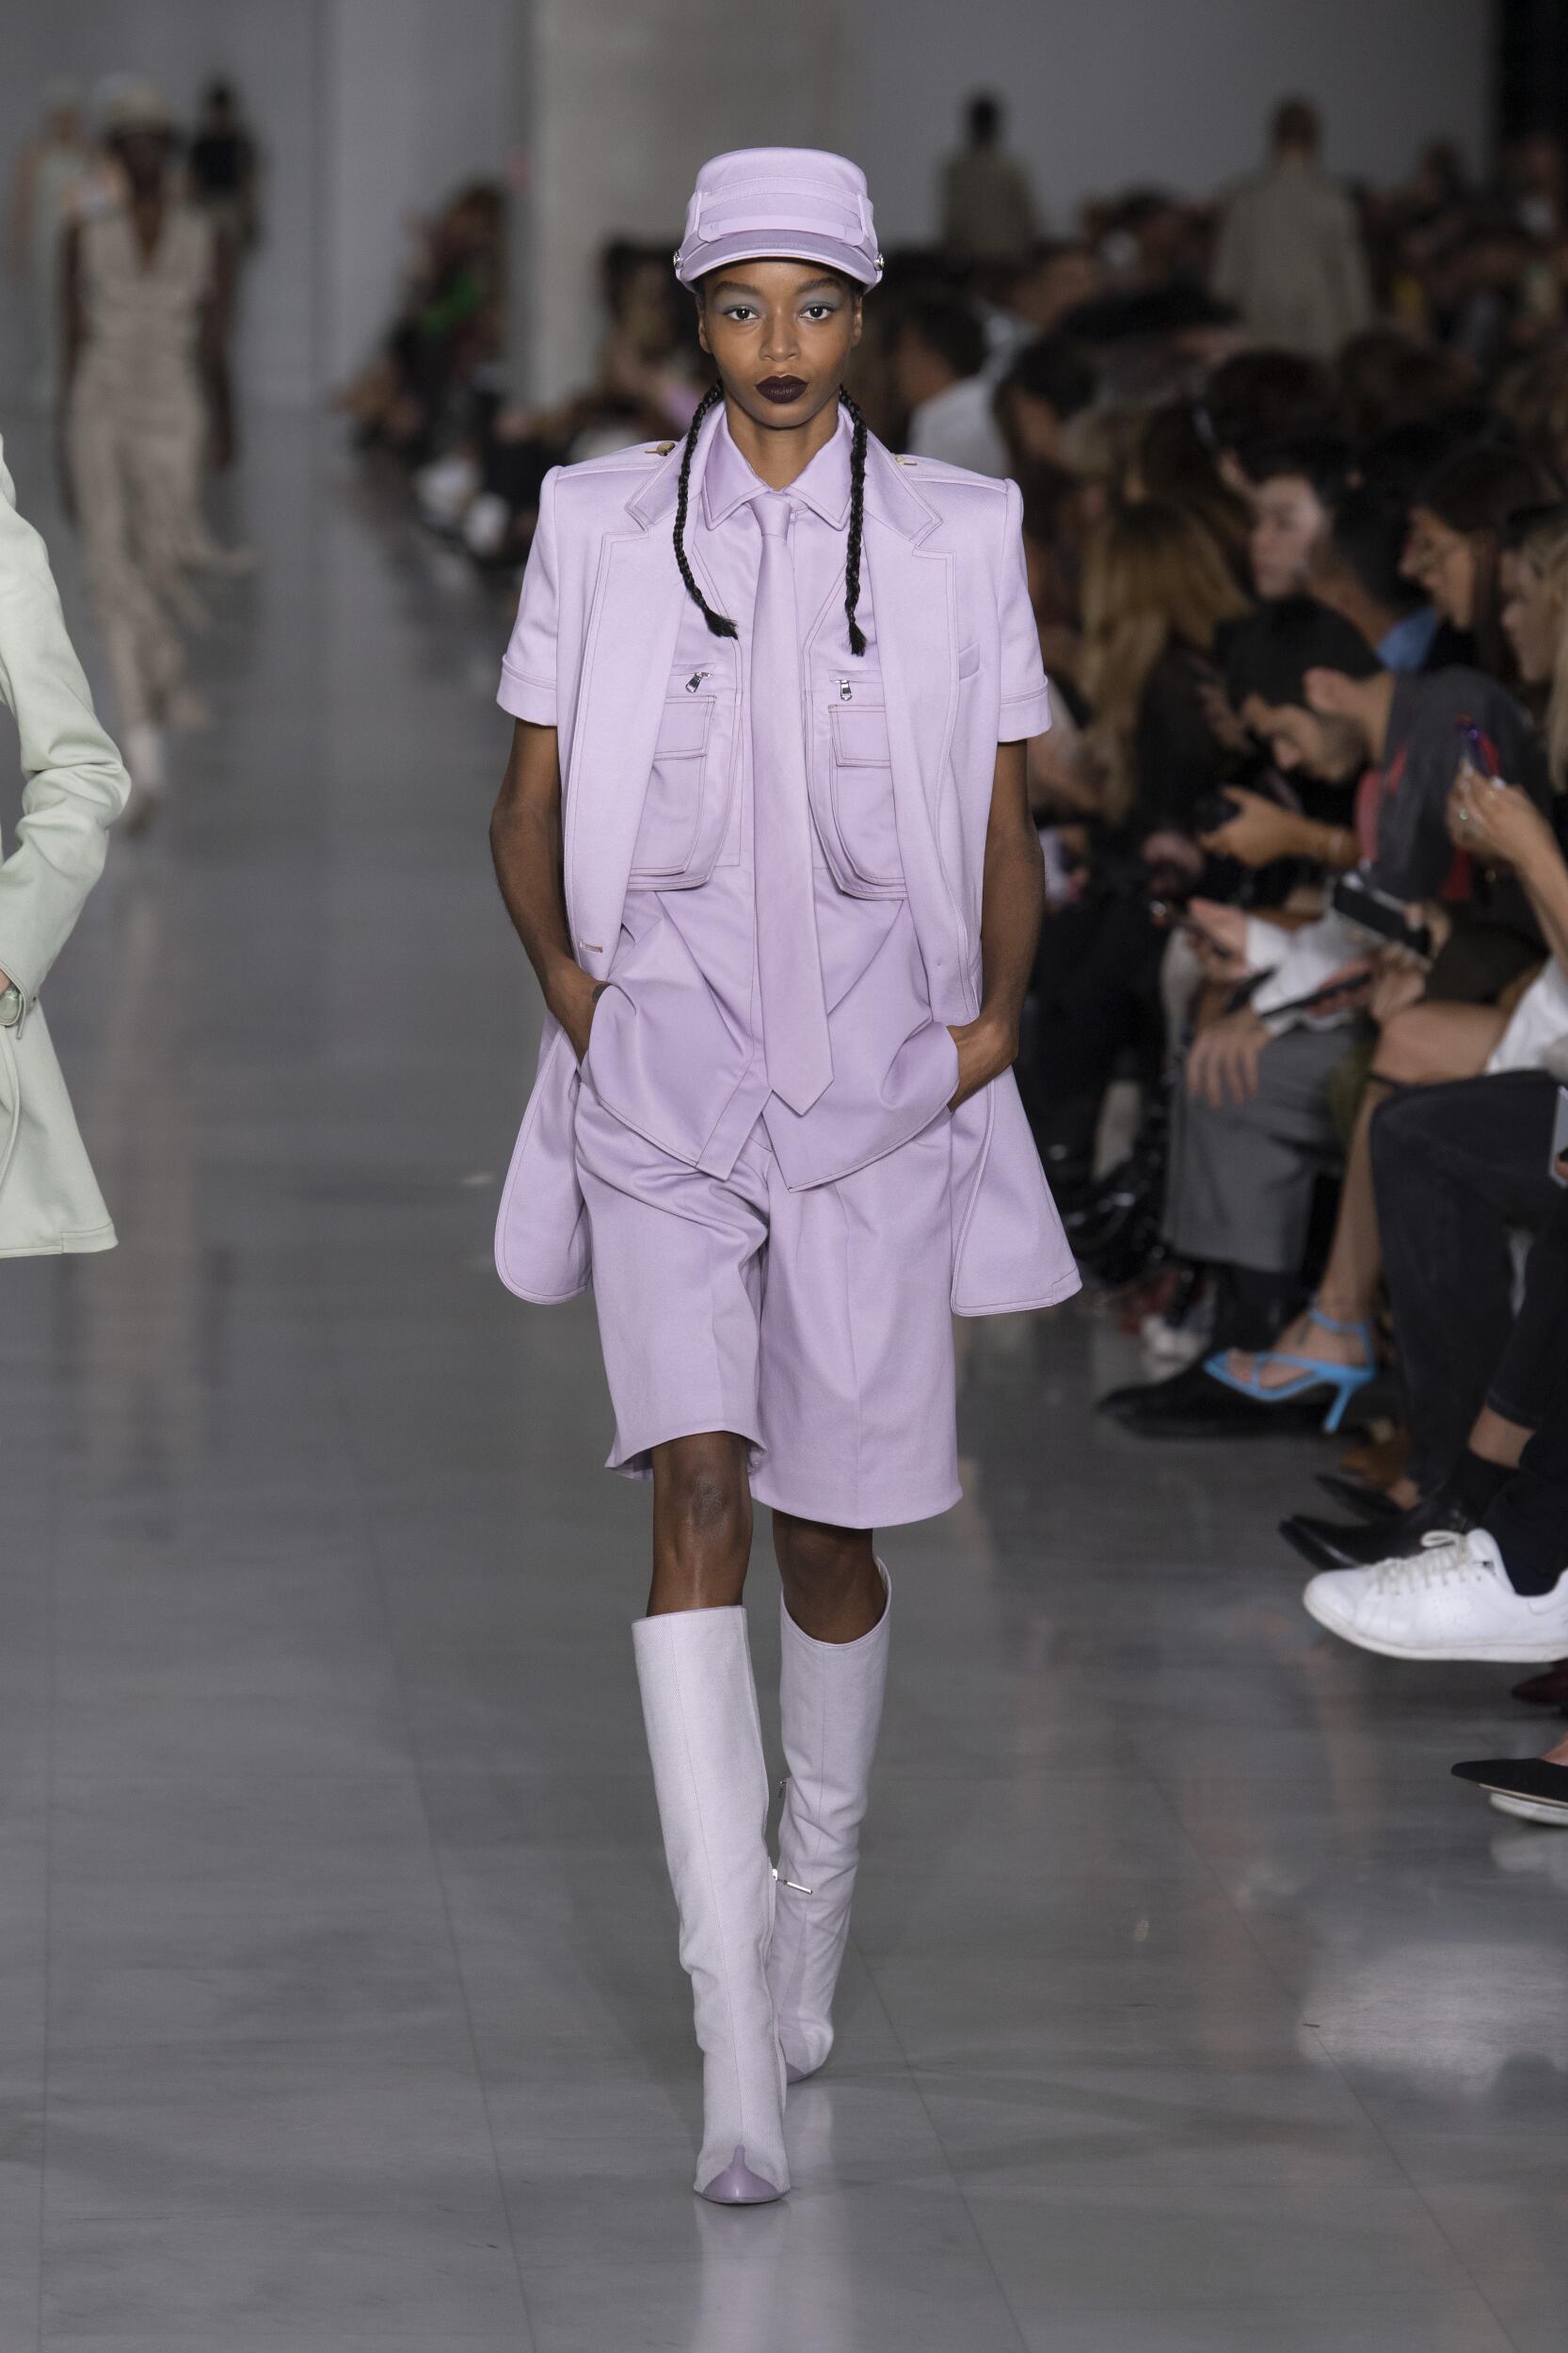 Woman SS 2020 Max Mara Show Milan Fashion Week